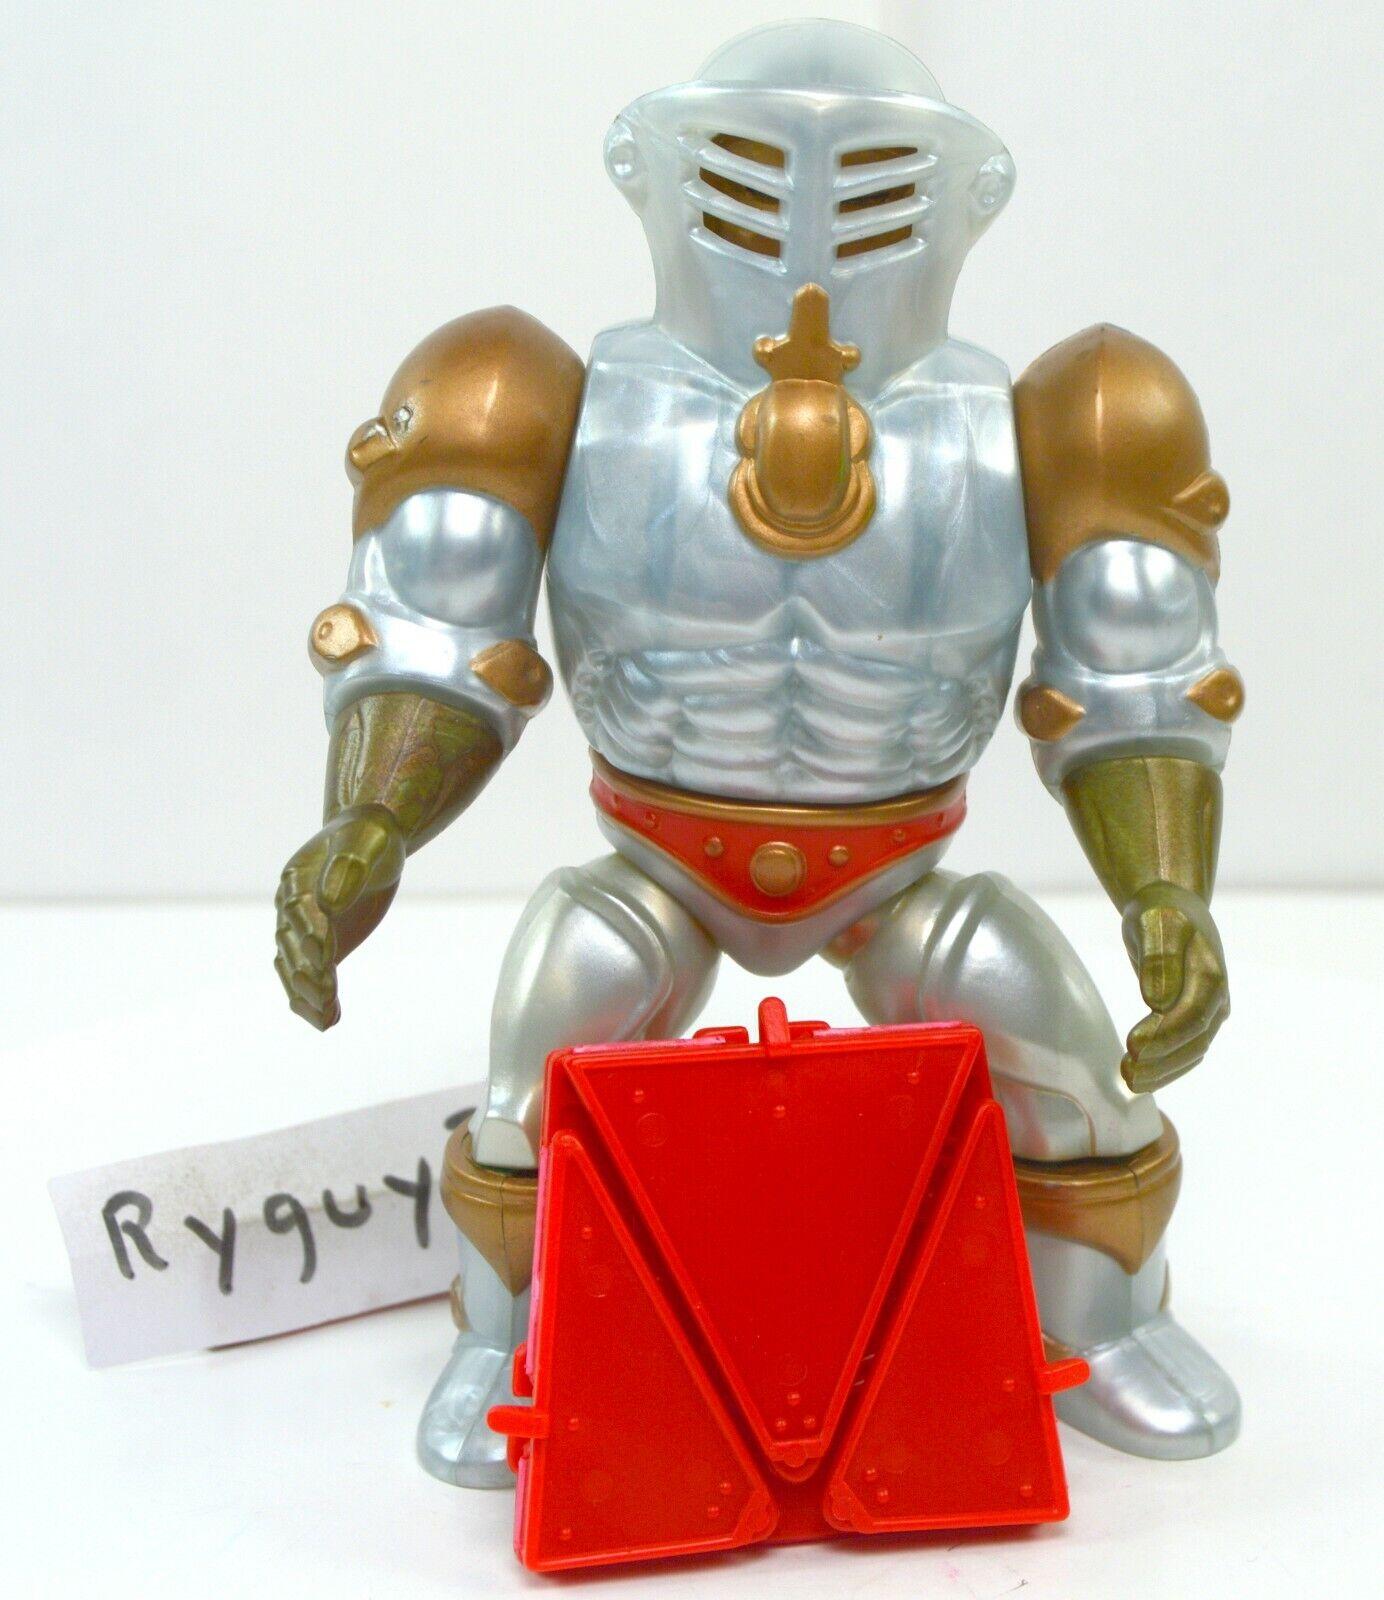 MOTU, Extendar, Masters of the Universe, shield, completare, cifra, He uomo, 100%